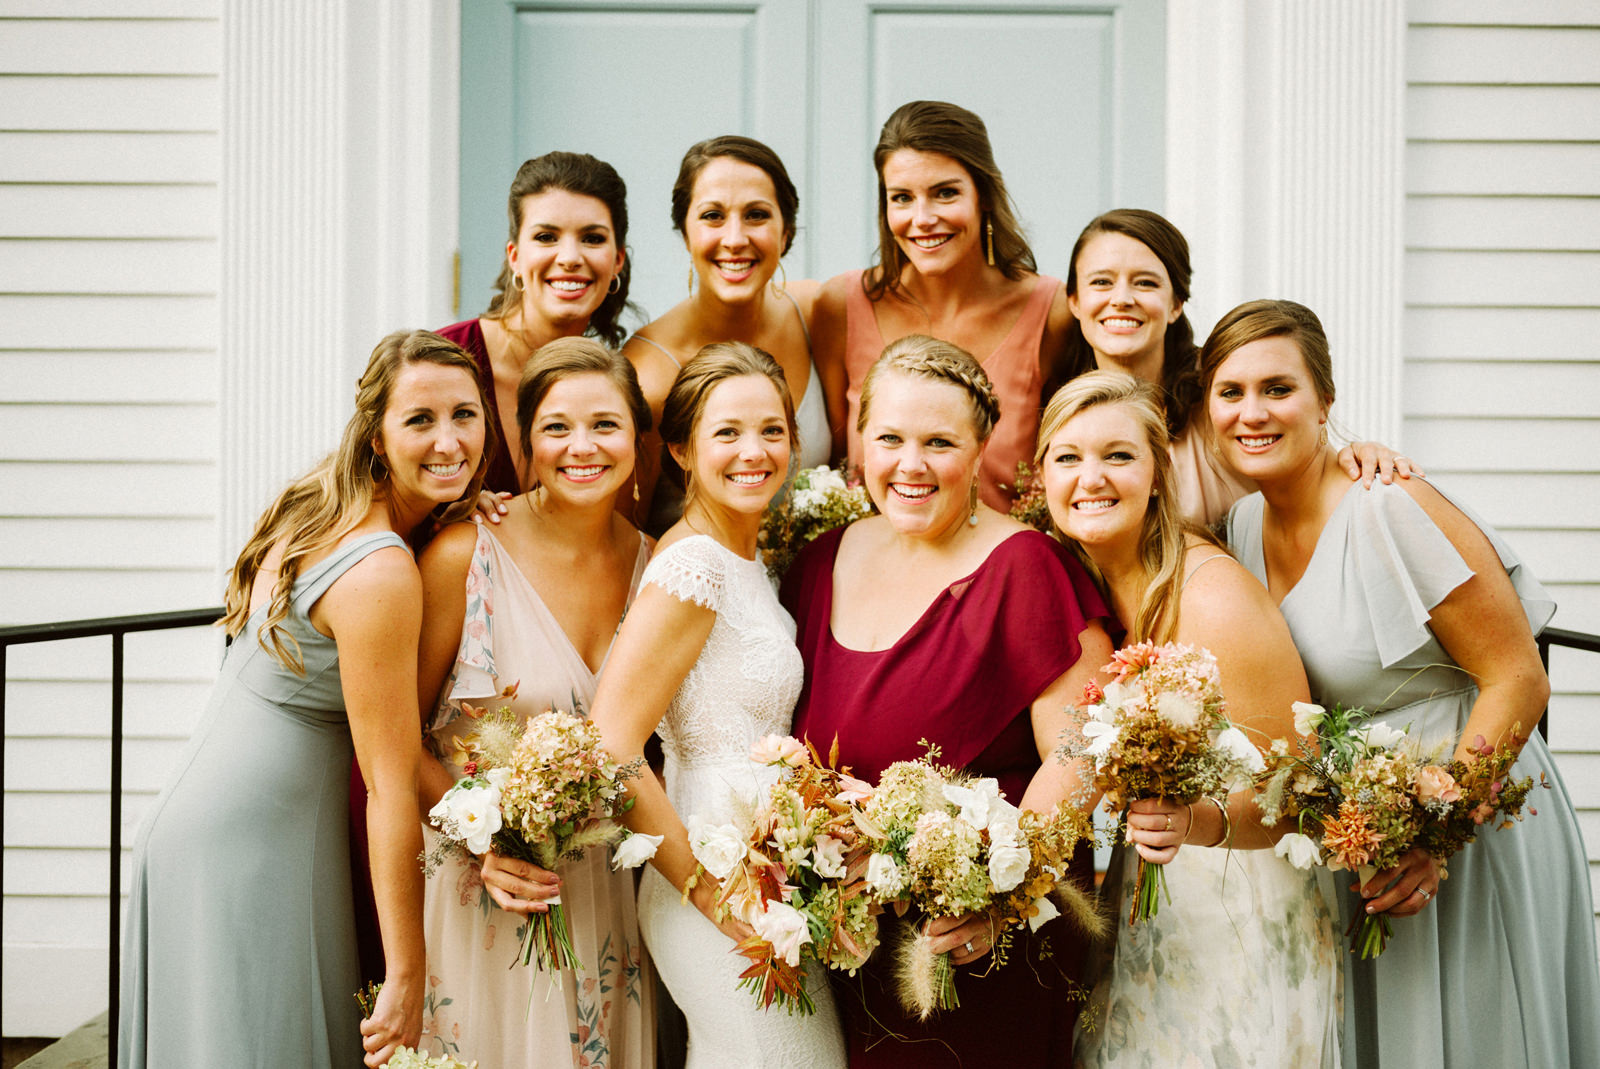 bridgeport-wedding-086 BRIDGEPORT, CONNECTICUT BACKYARD WEDDING